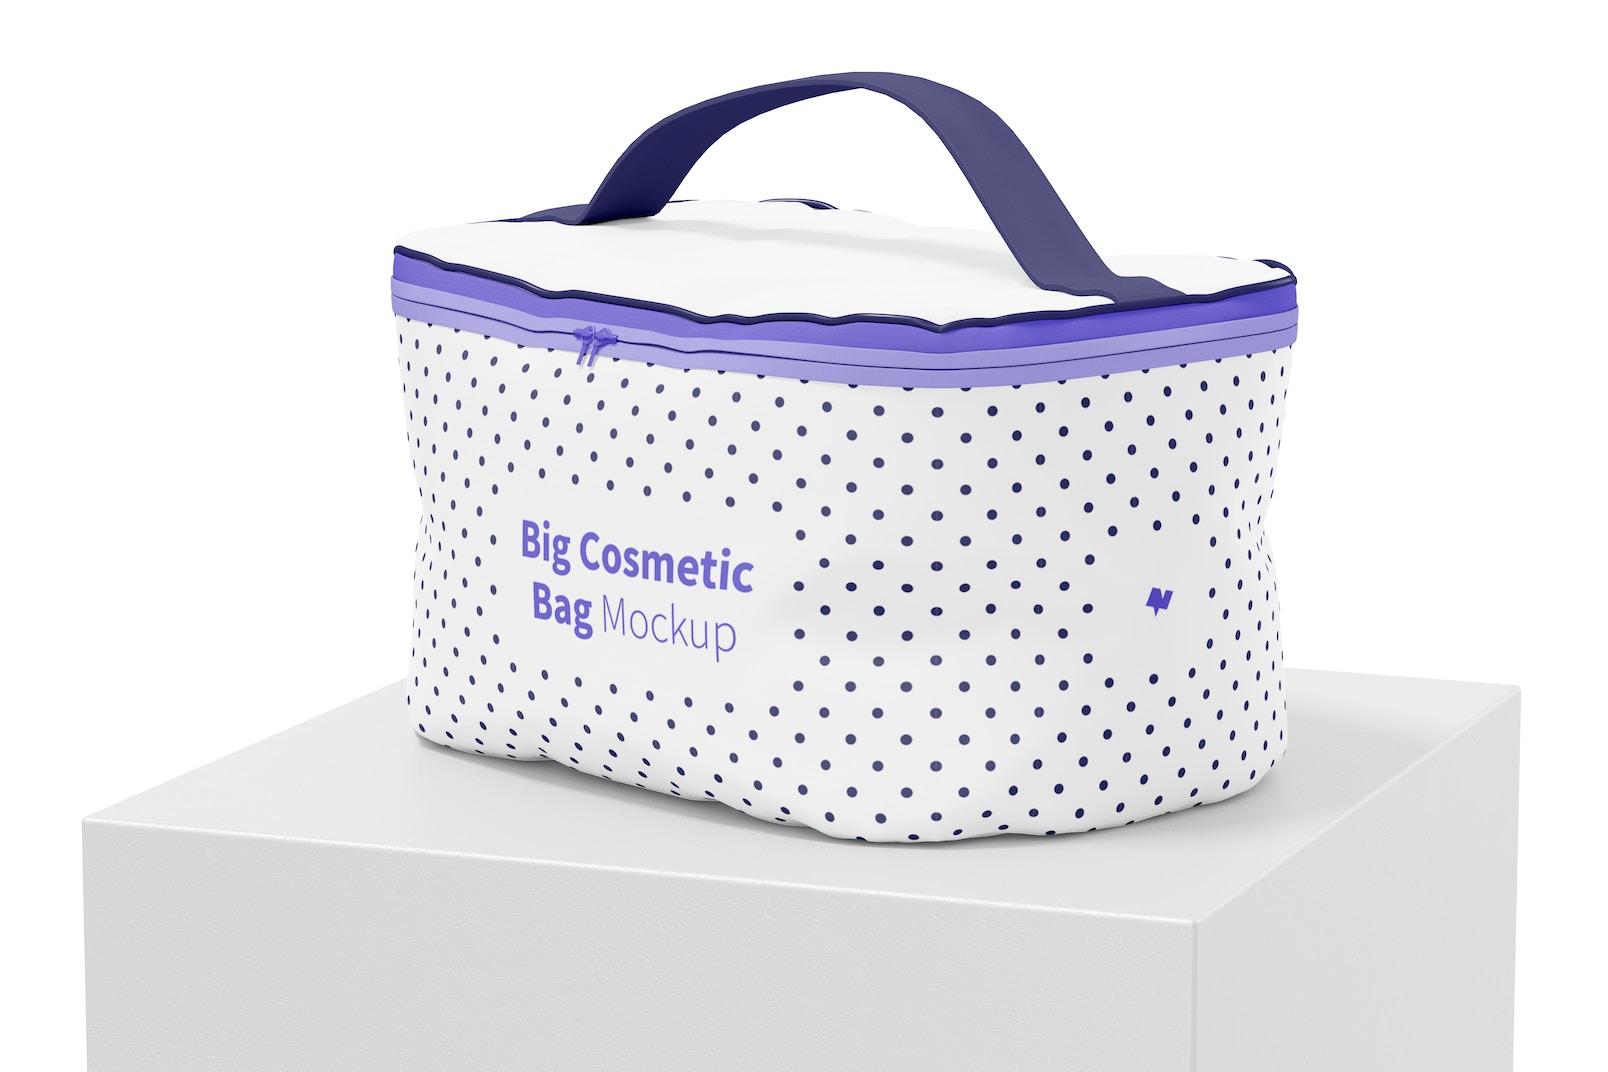 Big Cosmetic Bag Mockup